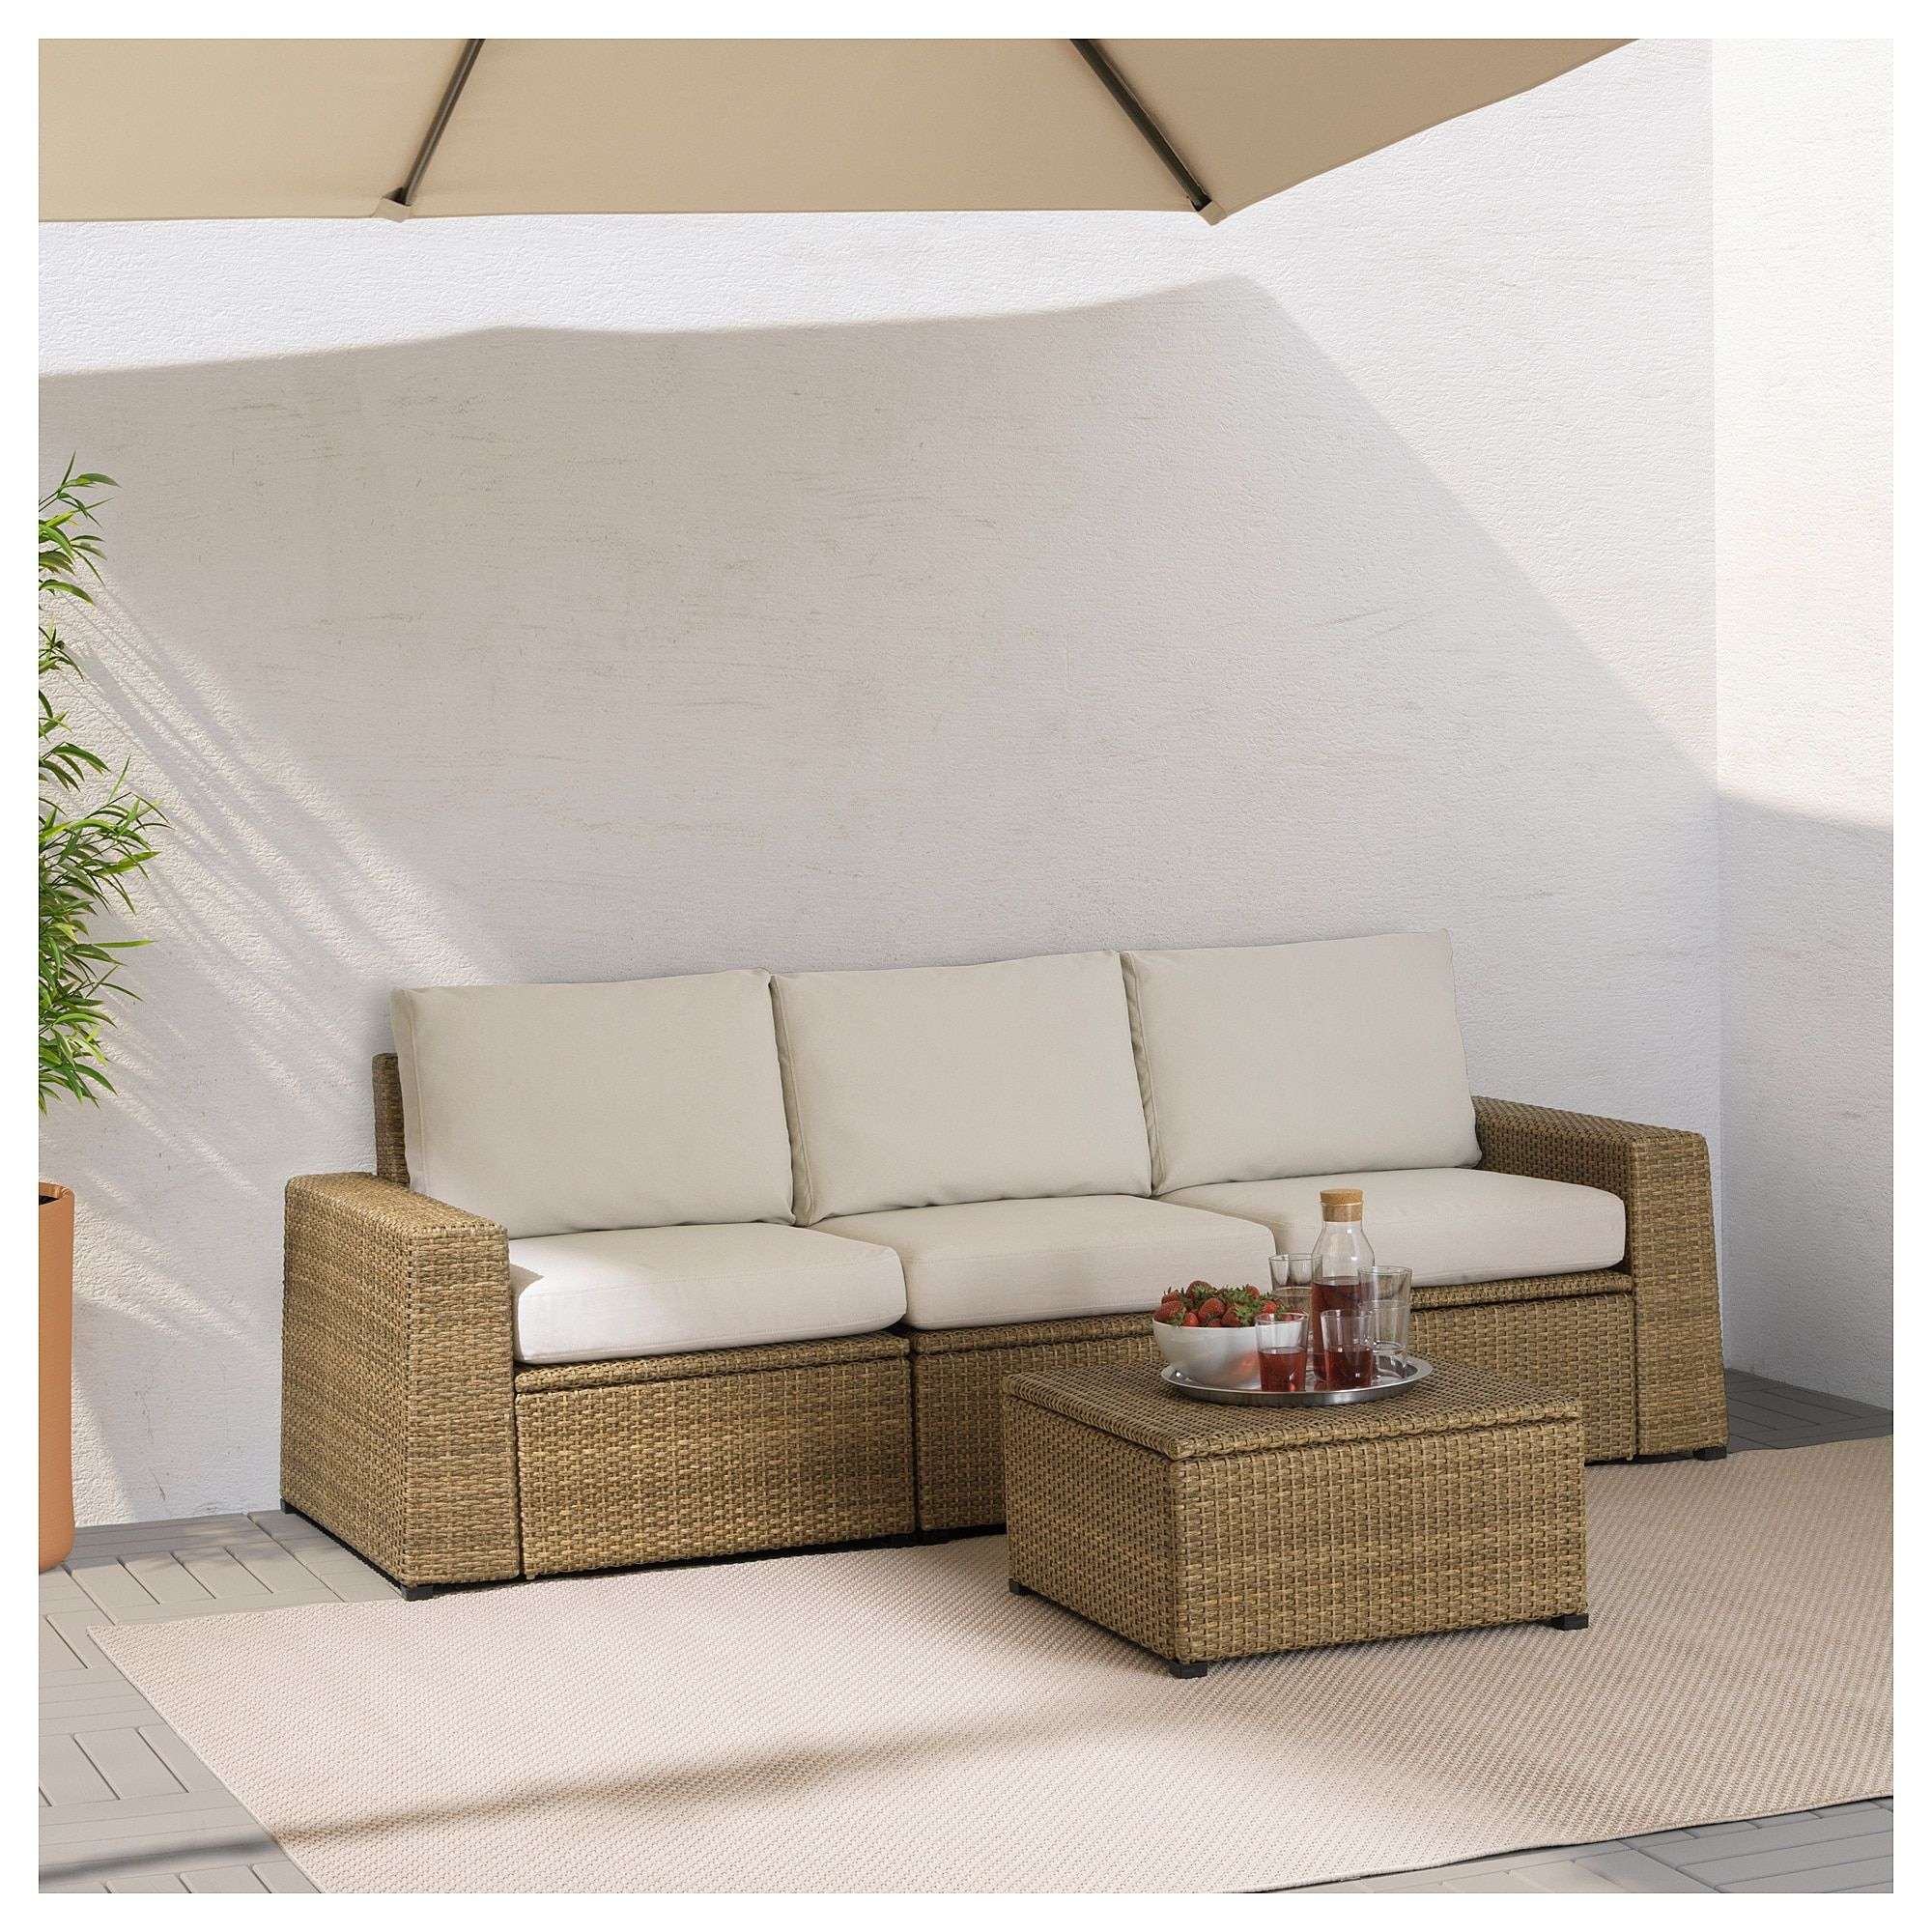 Ikea sollerön sofa outdoor brown frösön duvholmen beige